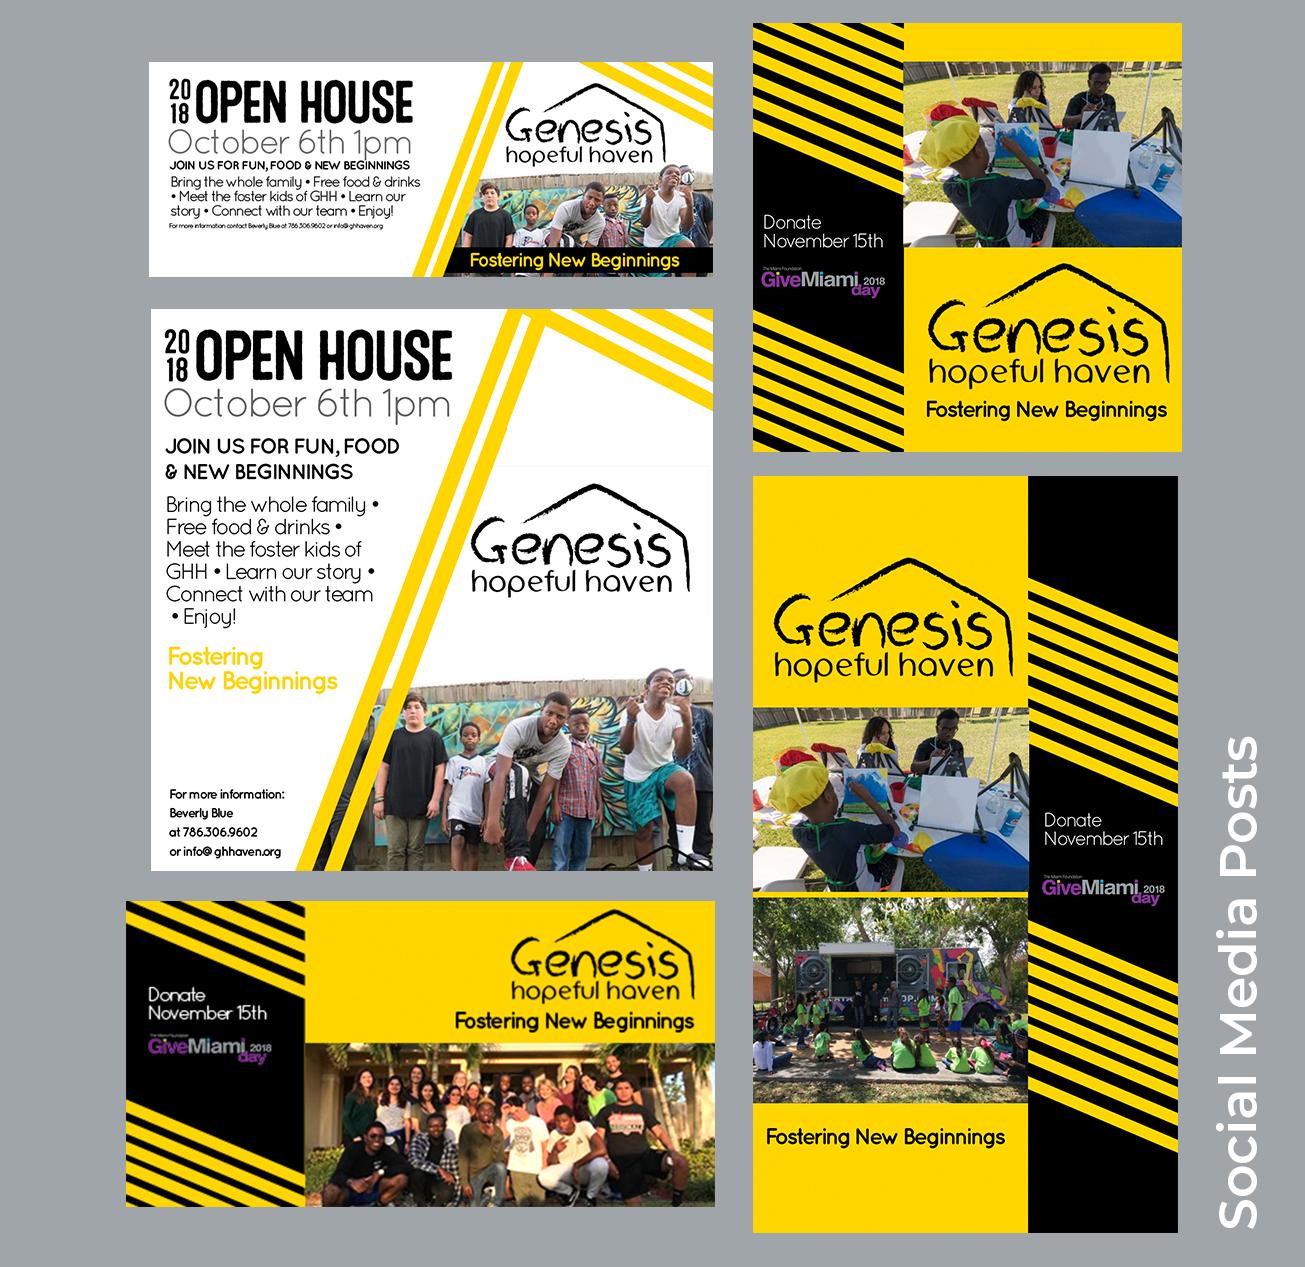 GenesisHouse.jpg